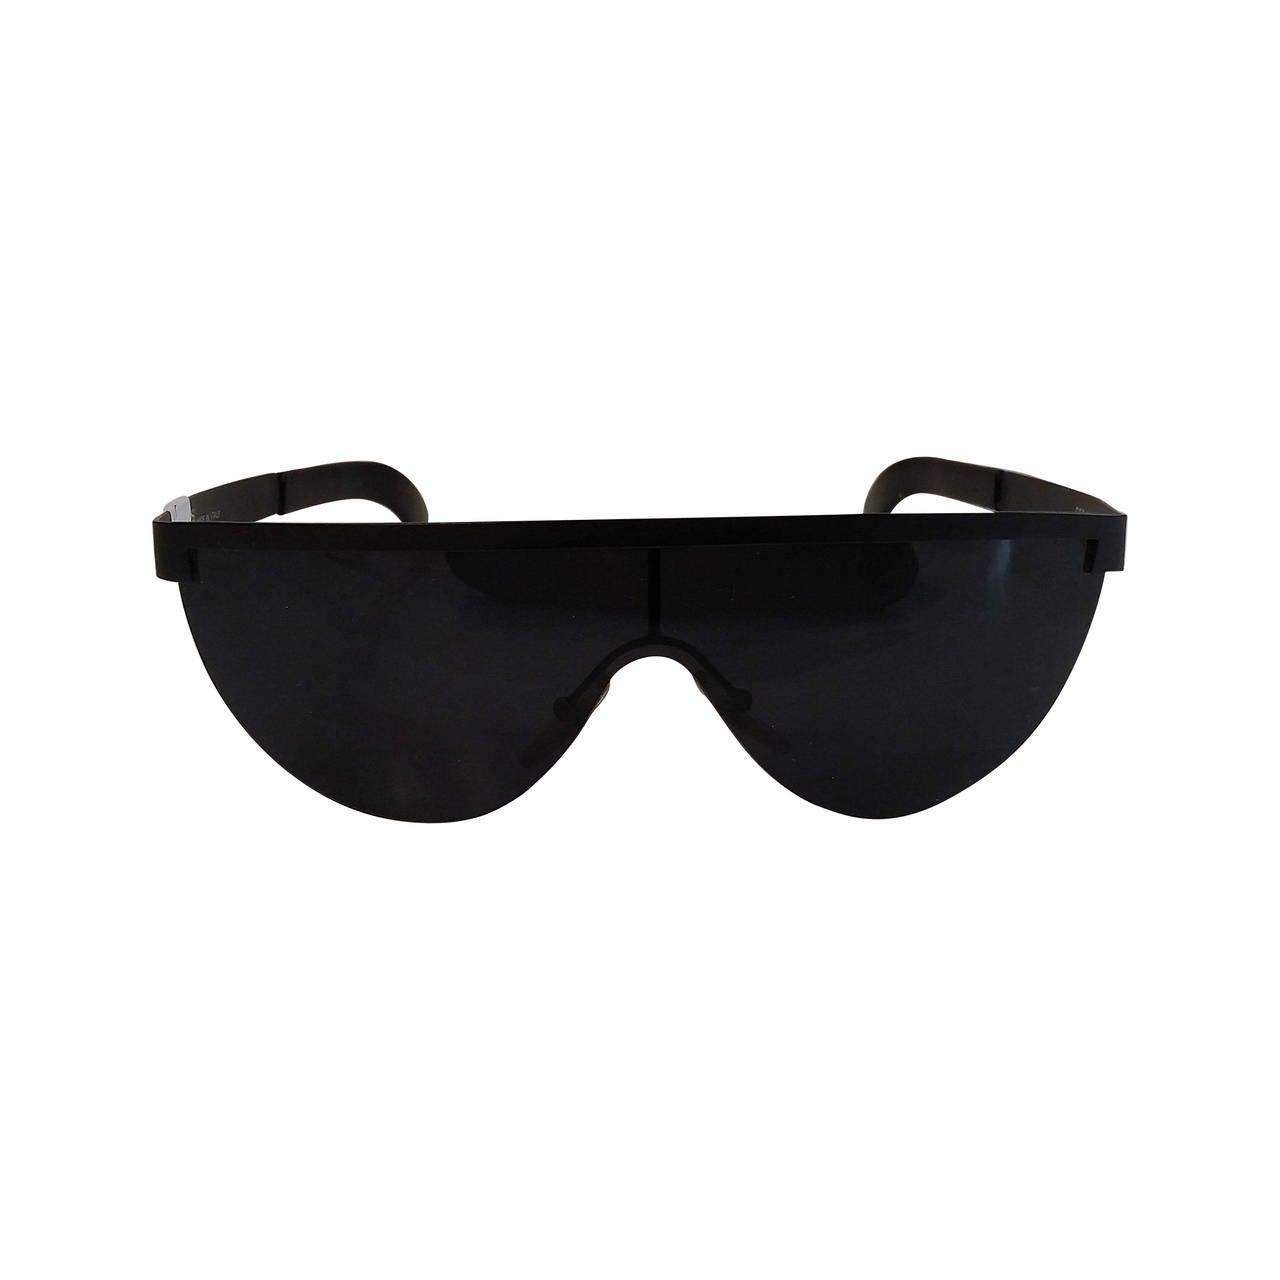 1980s Gianfranco Ferre black sunglasses 1